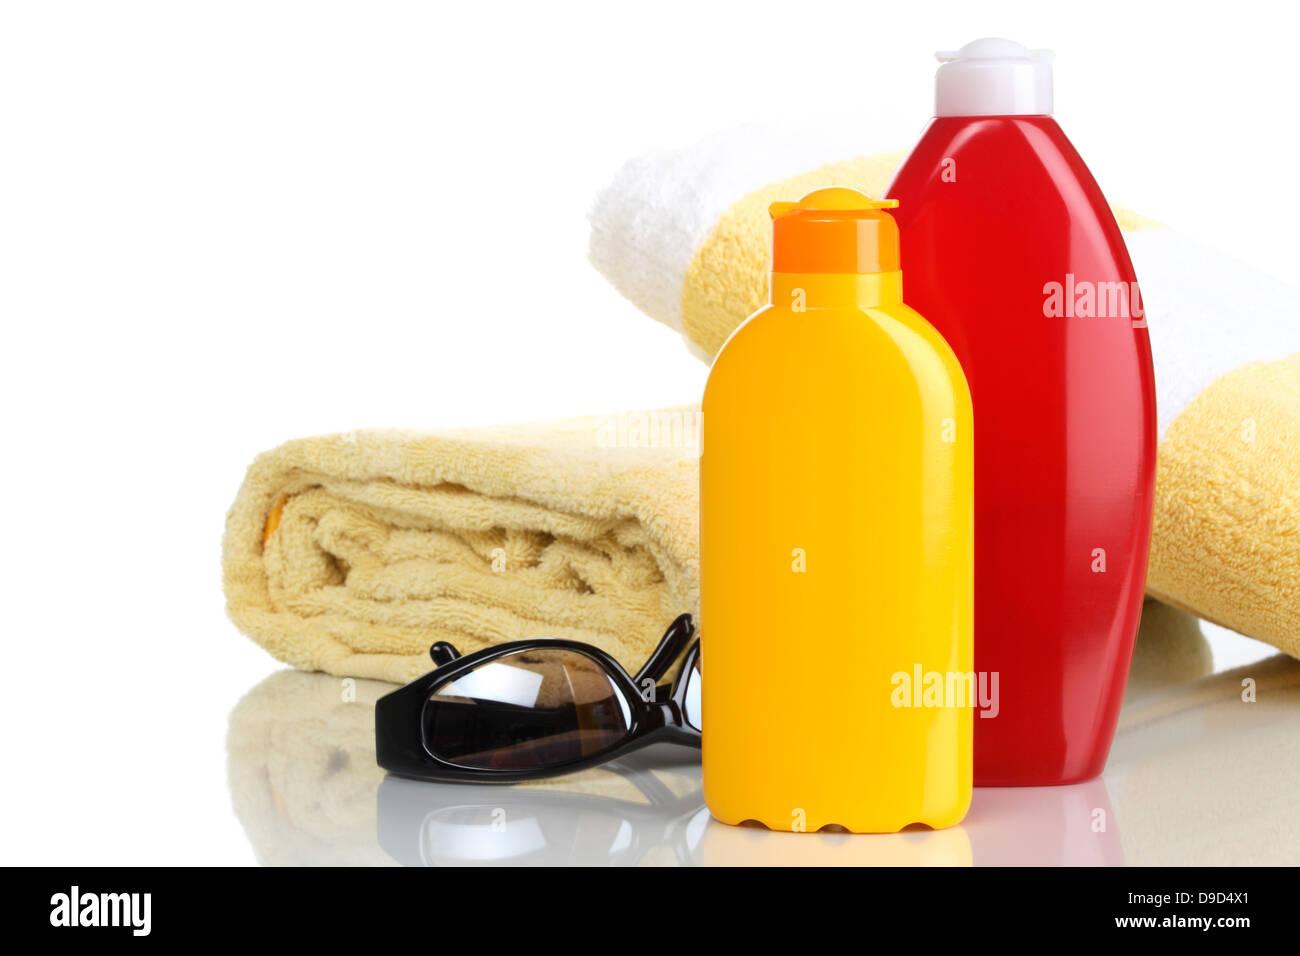 Bath sheets, sunglasses and solar cream - Stock Image